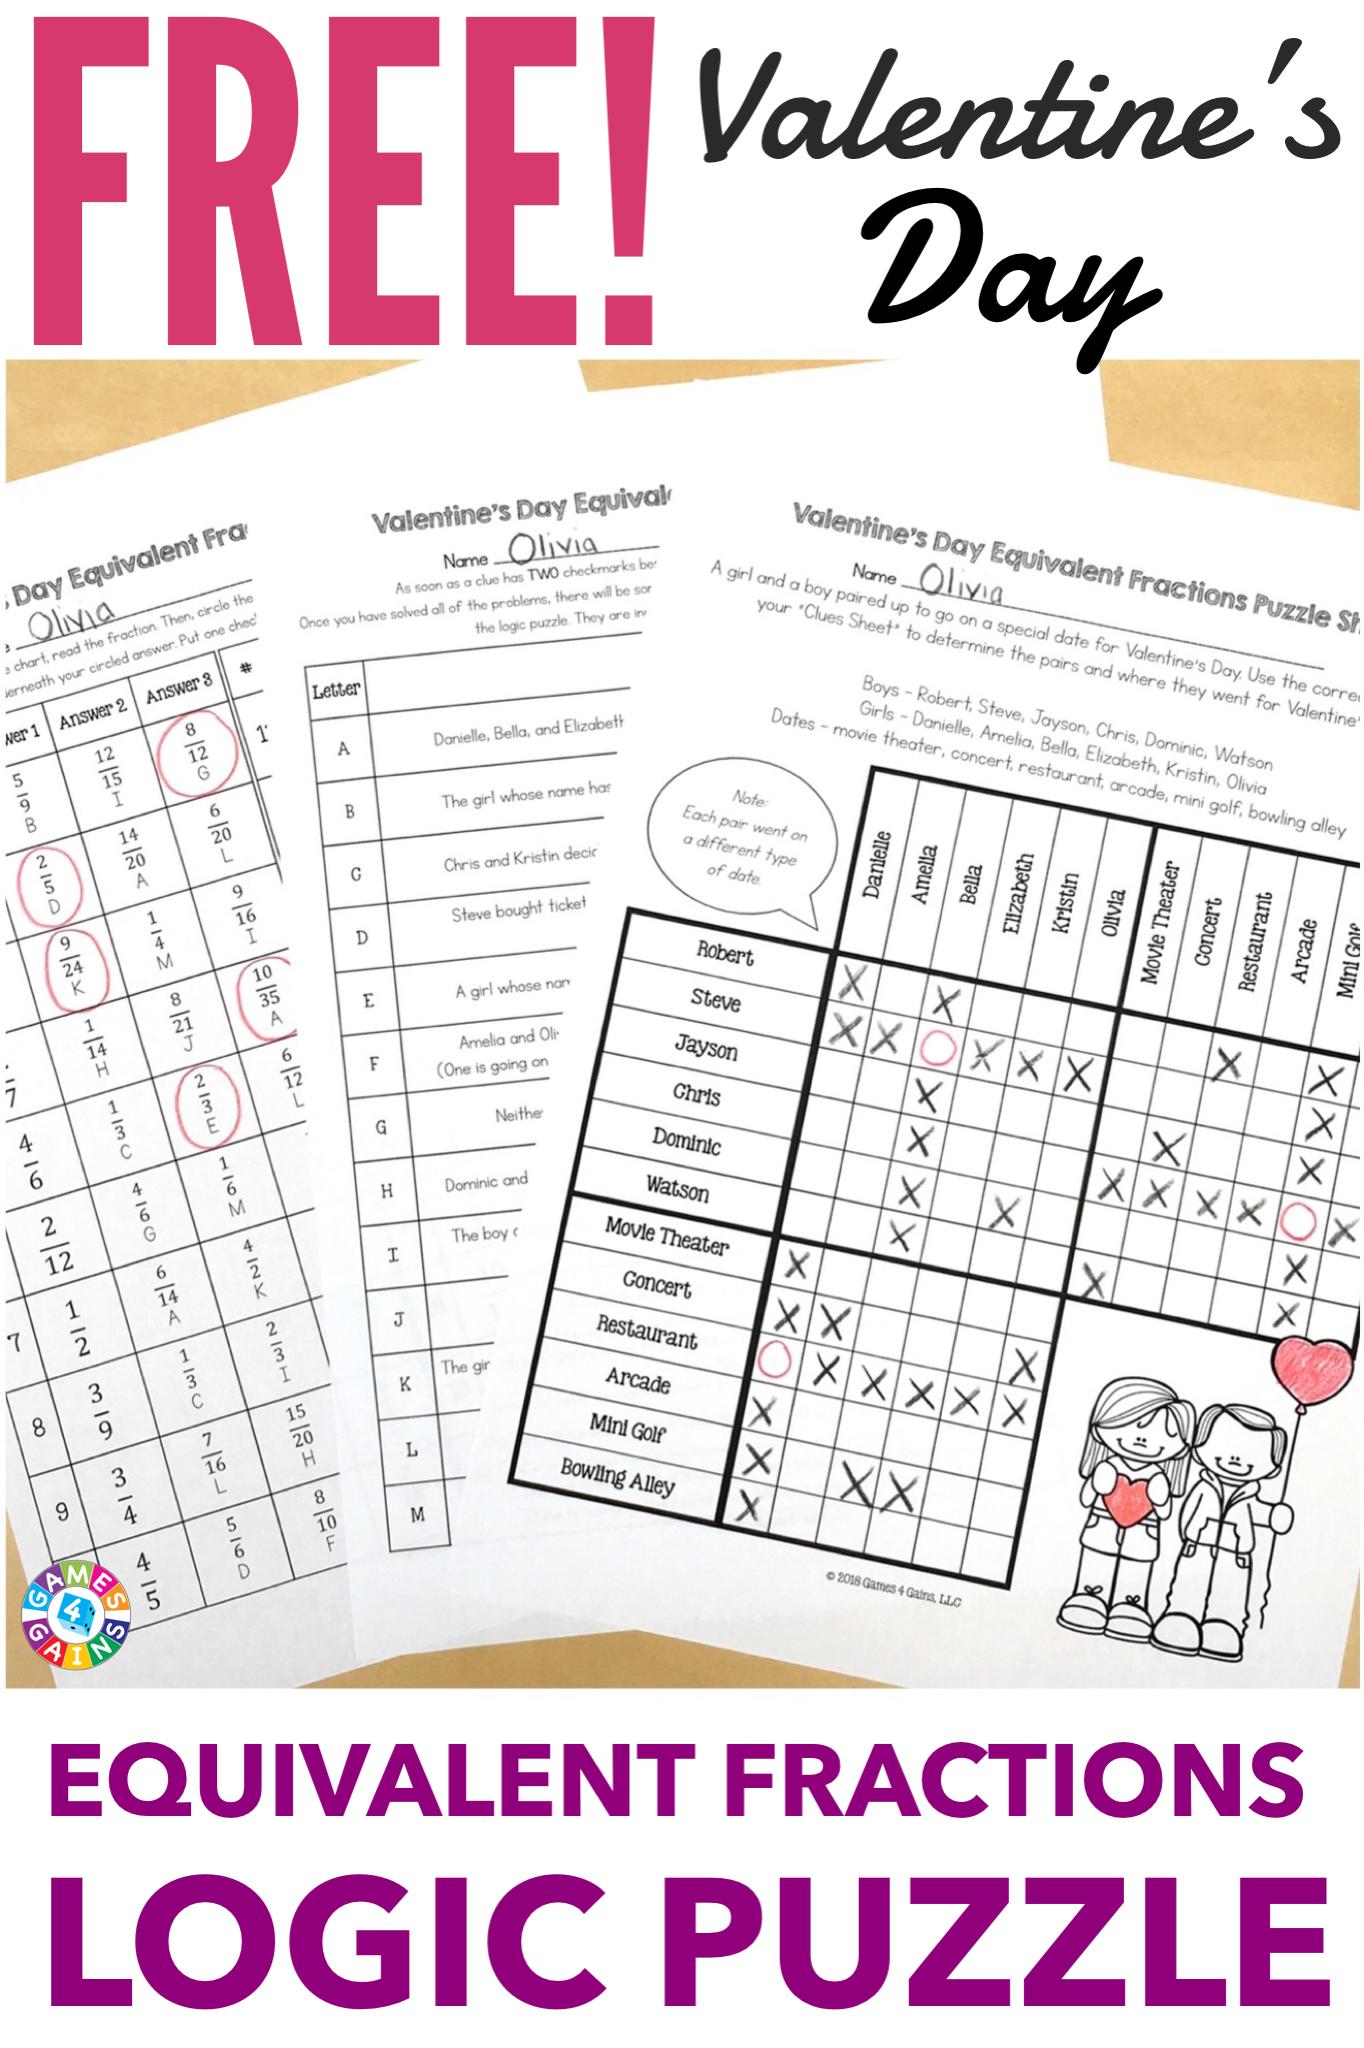 Free Valentine S Day Math Logic Puzzle